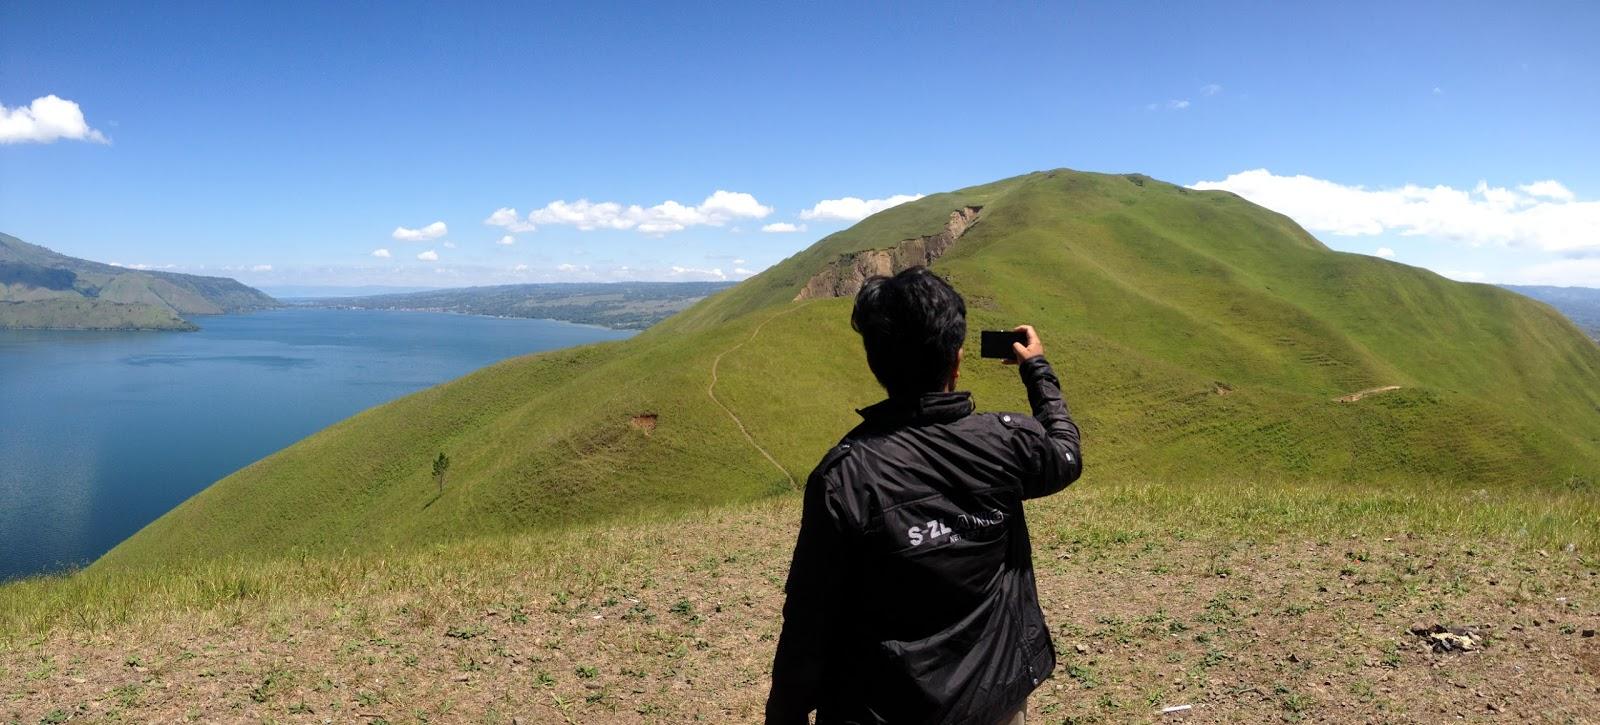 Panorama Bukit Teletubbies Desa Holbung Samosir Danau Toba Sipinsur Kab